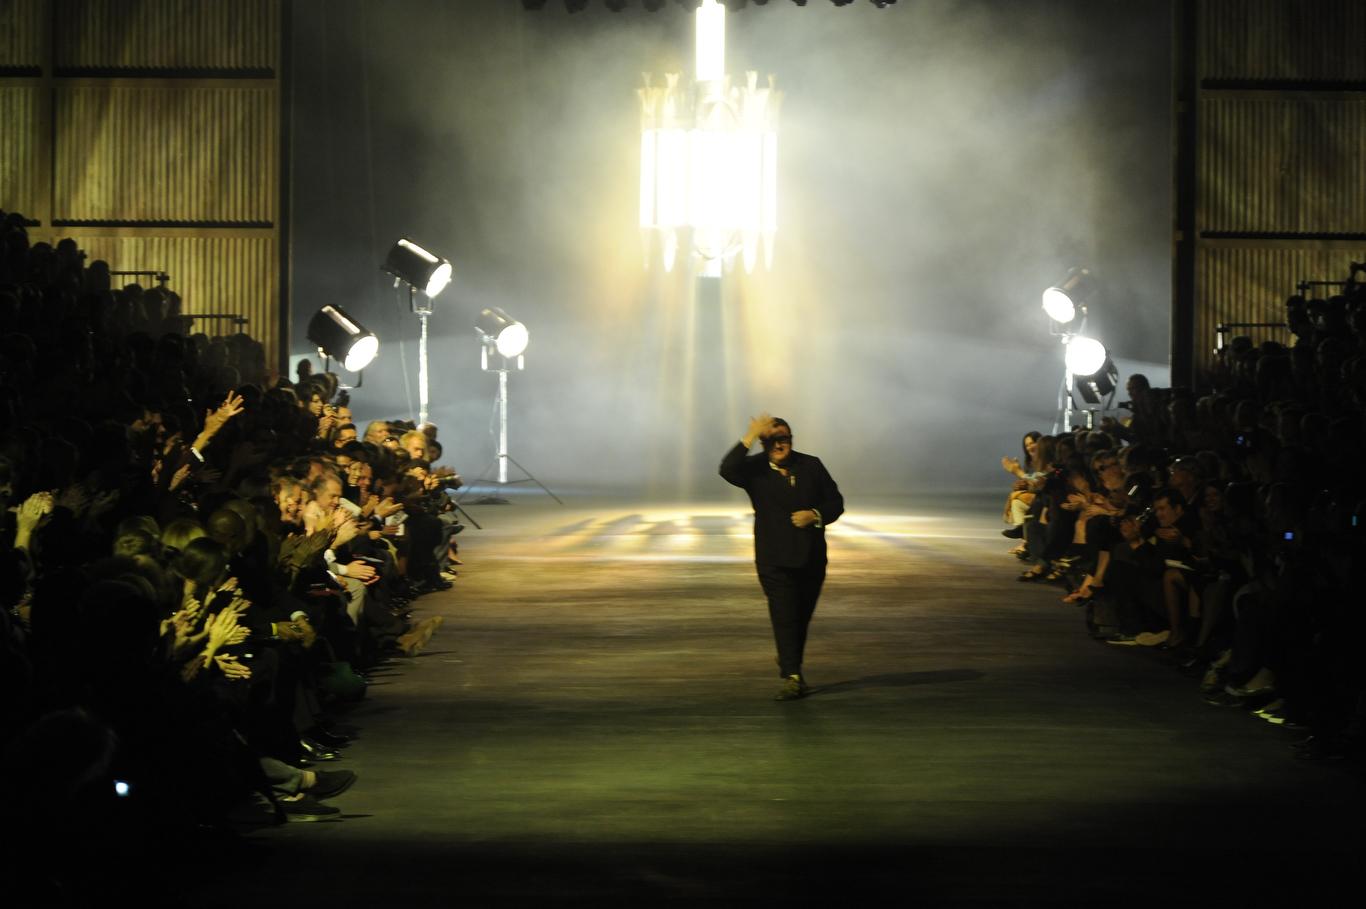 Designer Alber Elbaz on the runway after his Lanvin spring 2010 show at Halle Freyssinet.